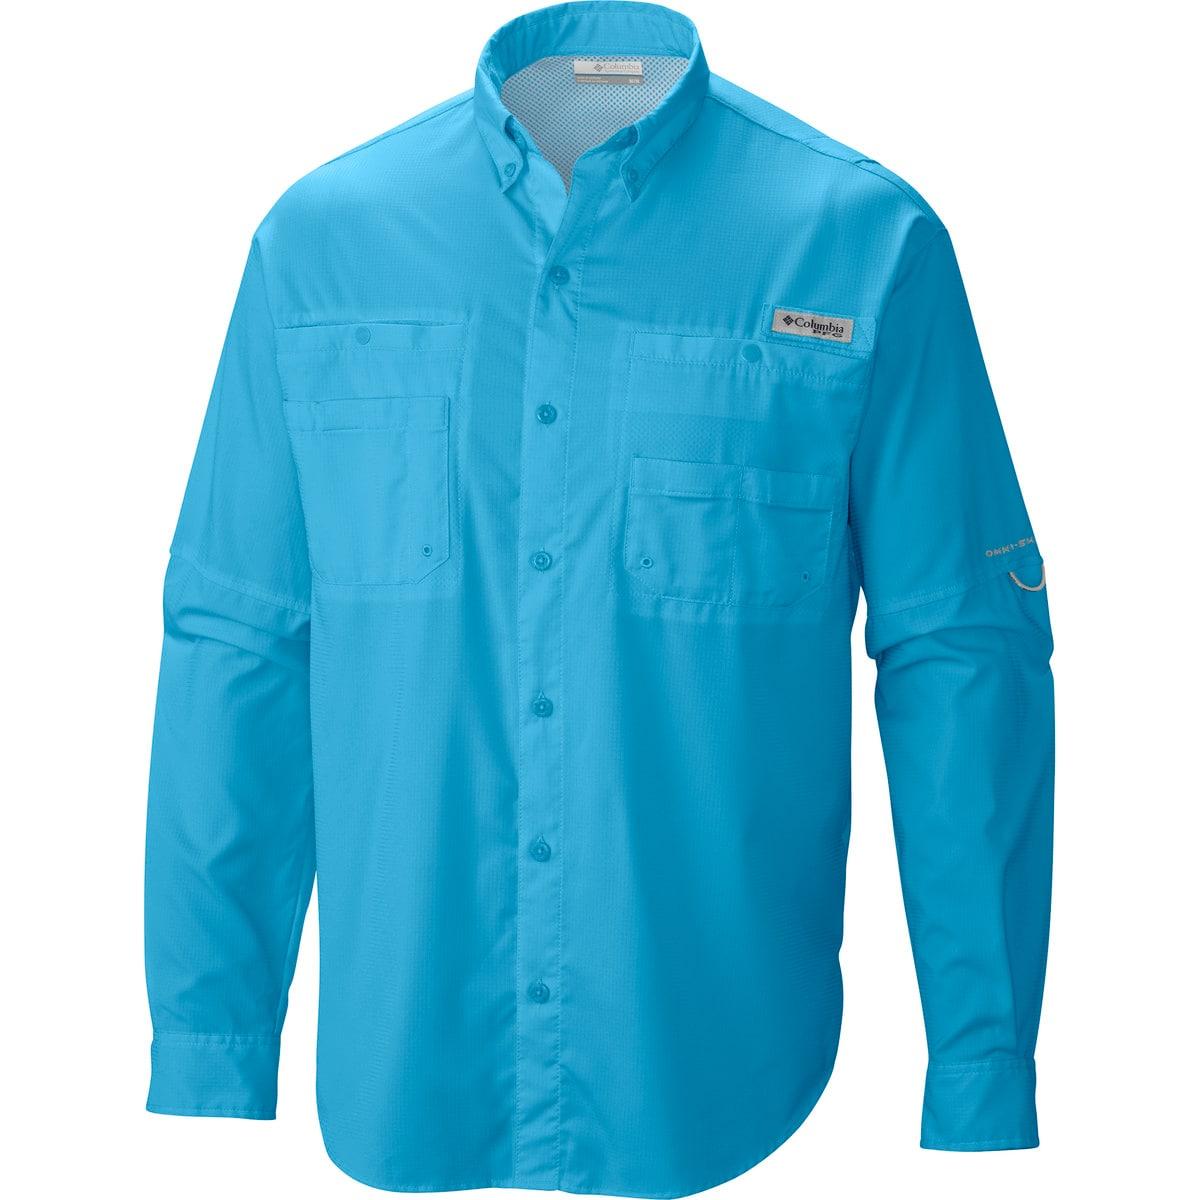 Columbia Tamiami II Button-Down Shirt - Men